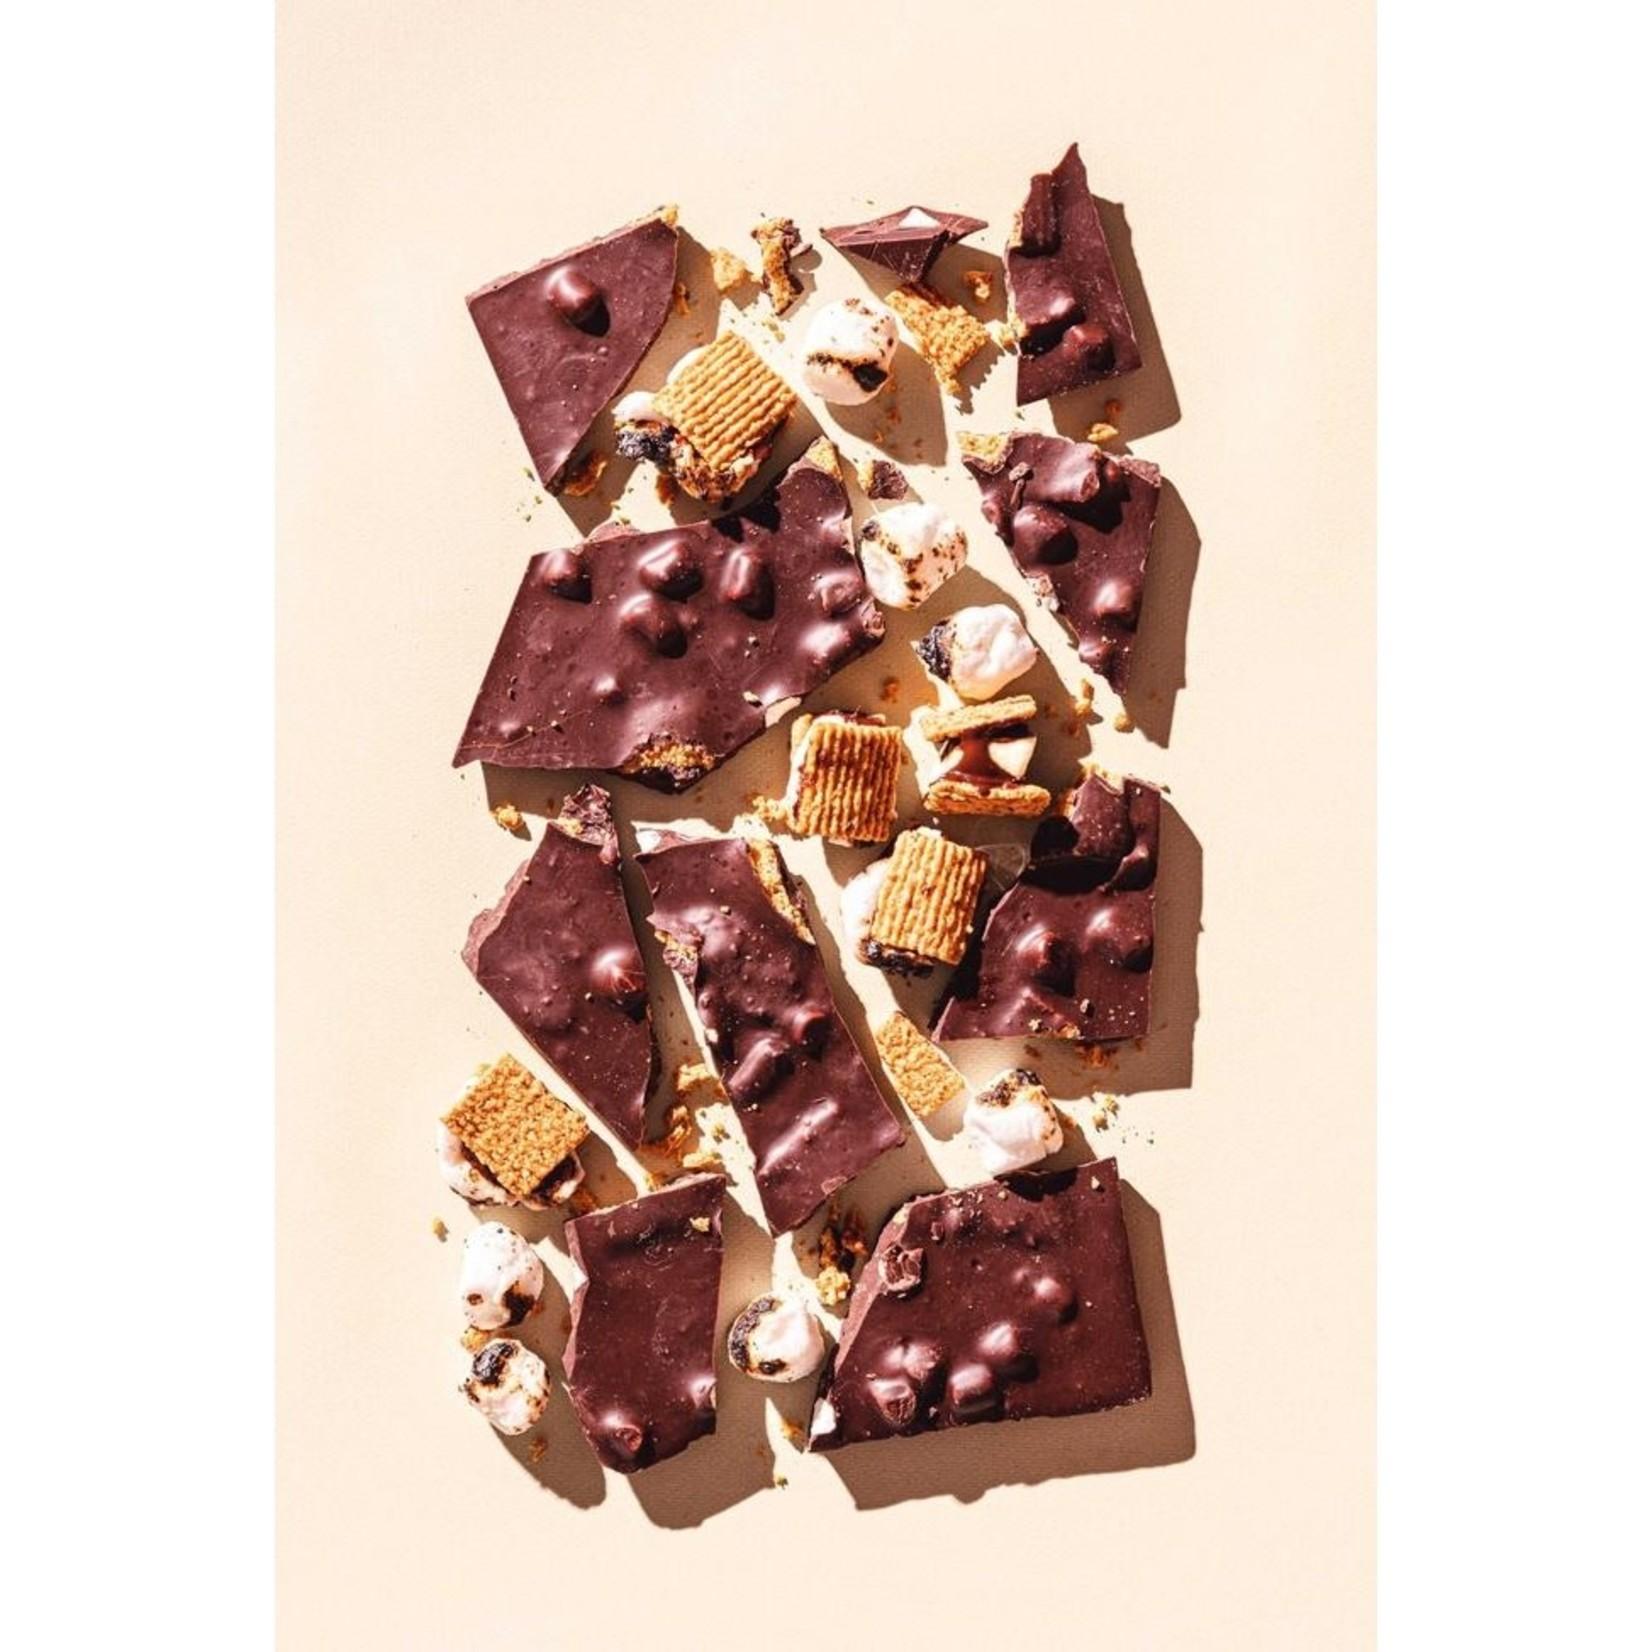 Compartes Chocolate Compartes Chocolate Campfire S'Mores Chocolate Bar